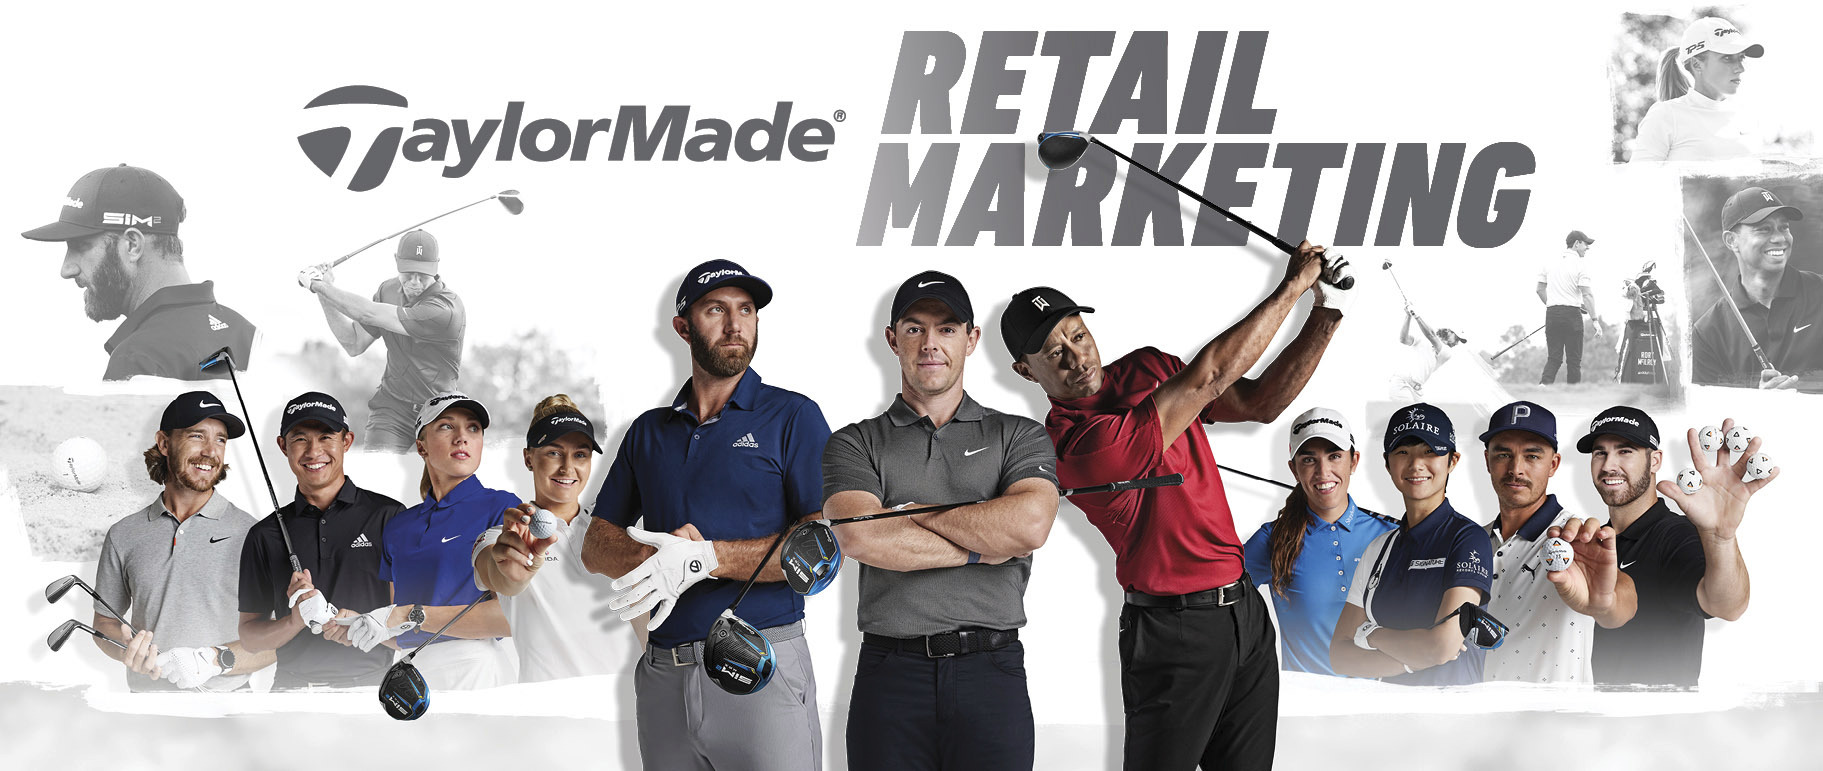 TaylorMade Retail Marketing